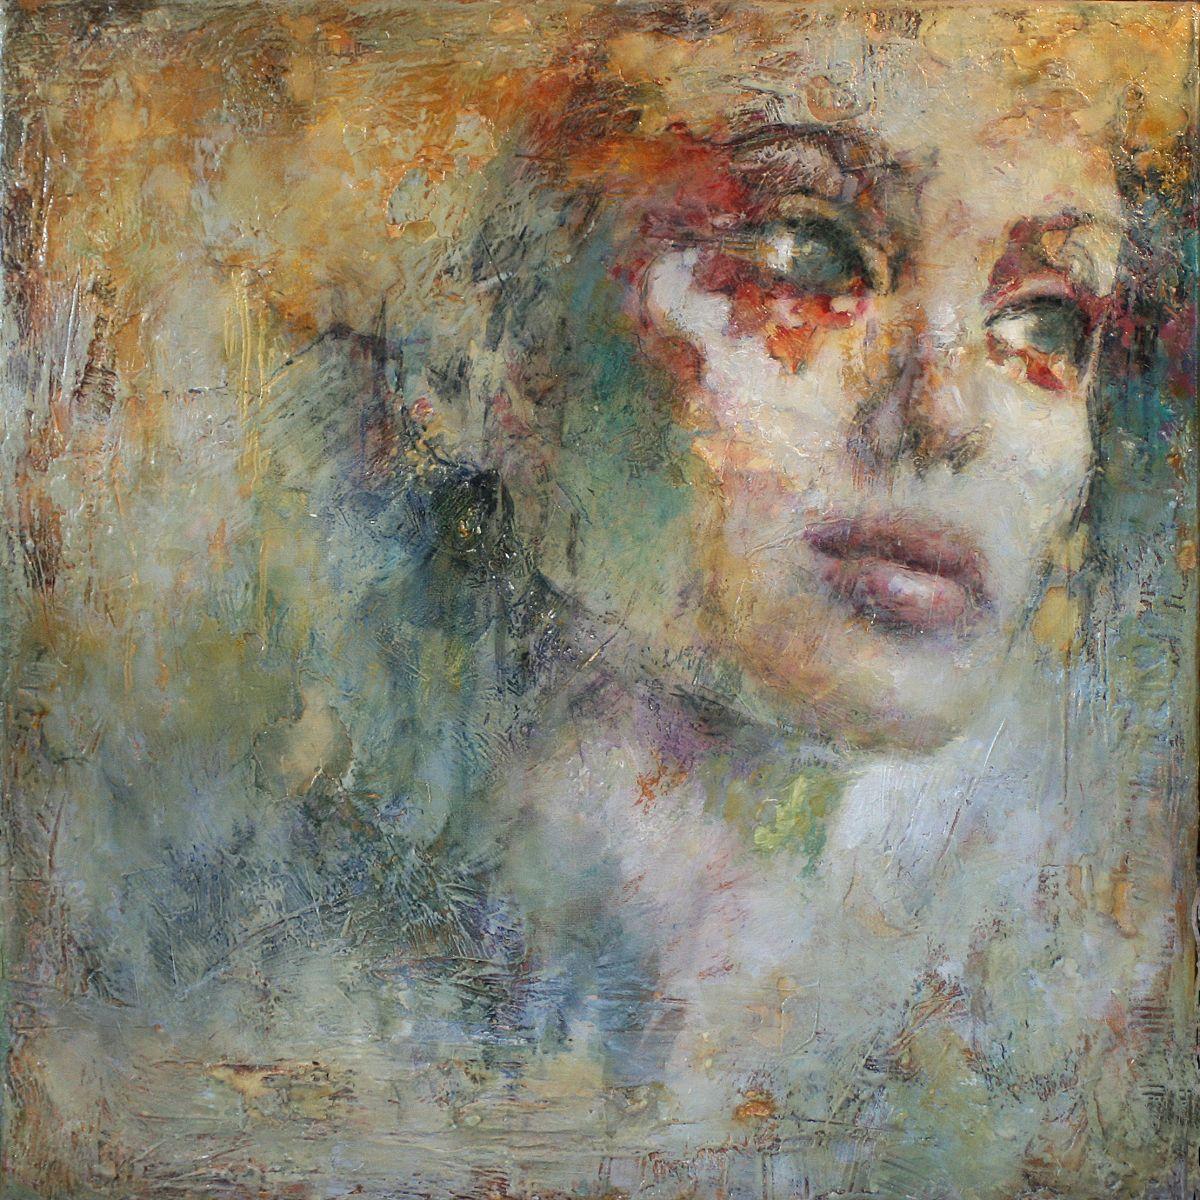 Kunst: A touch of gold van kunstenaar Evelyn Hamilton